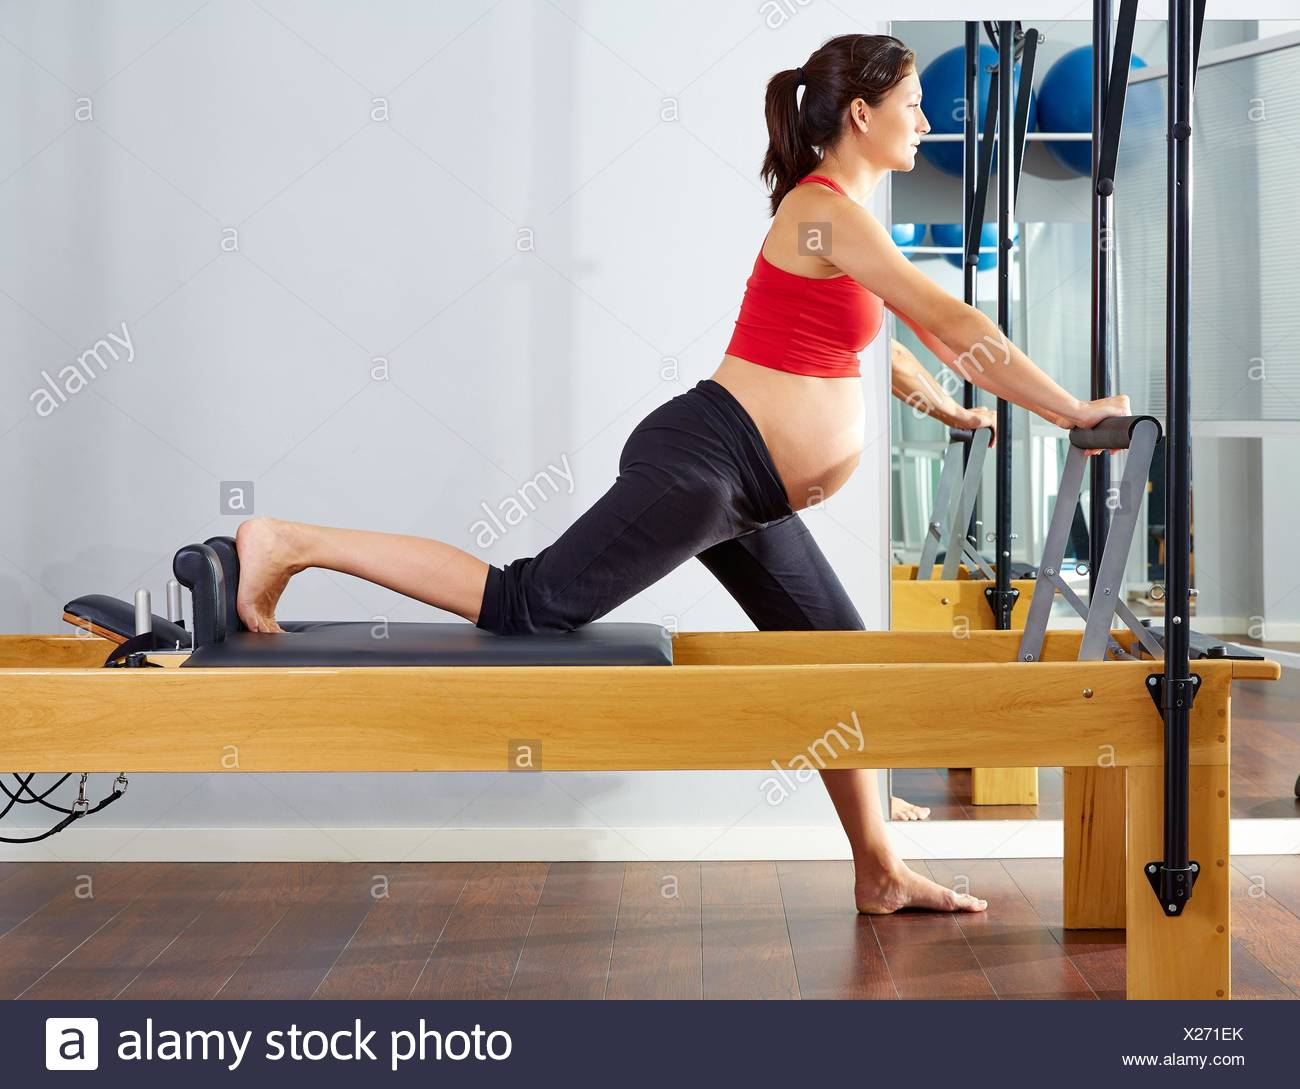 Pregnant Woman Pilates Reformer Cadillac Imágenes De Stock